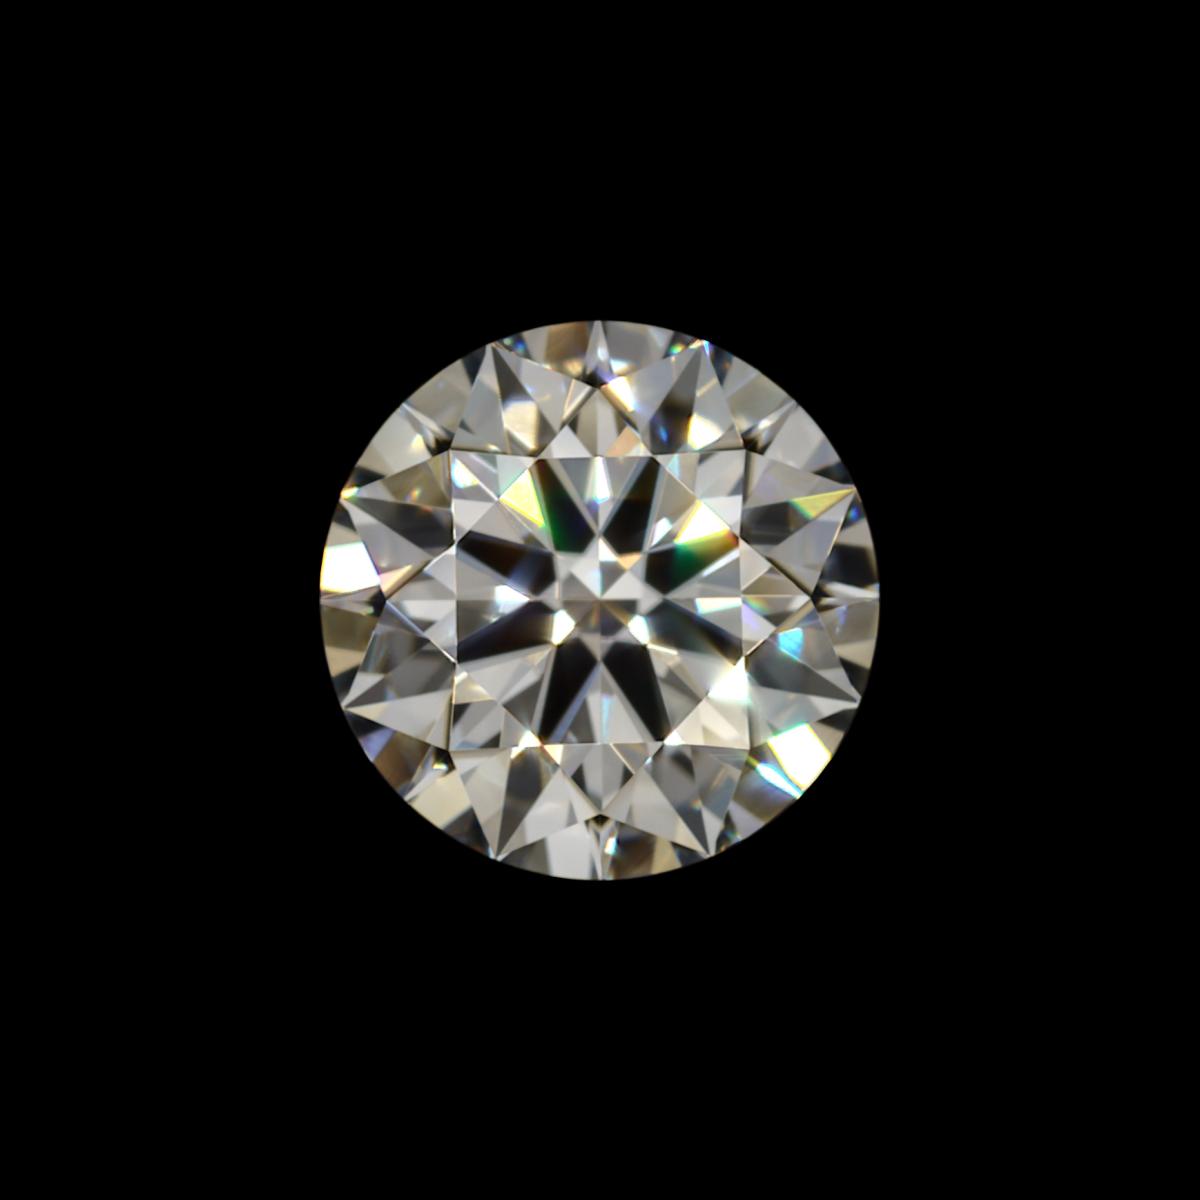 https://cdn.briangavindiamonds.com/files/mp4/CBLAGS-104107285028/CBLAGS-104107285028-Fire-02.mp4